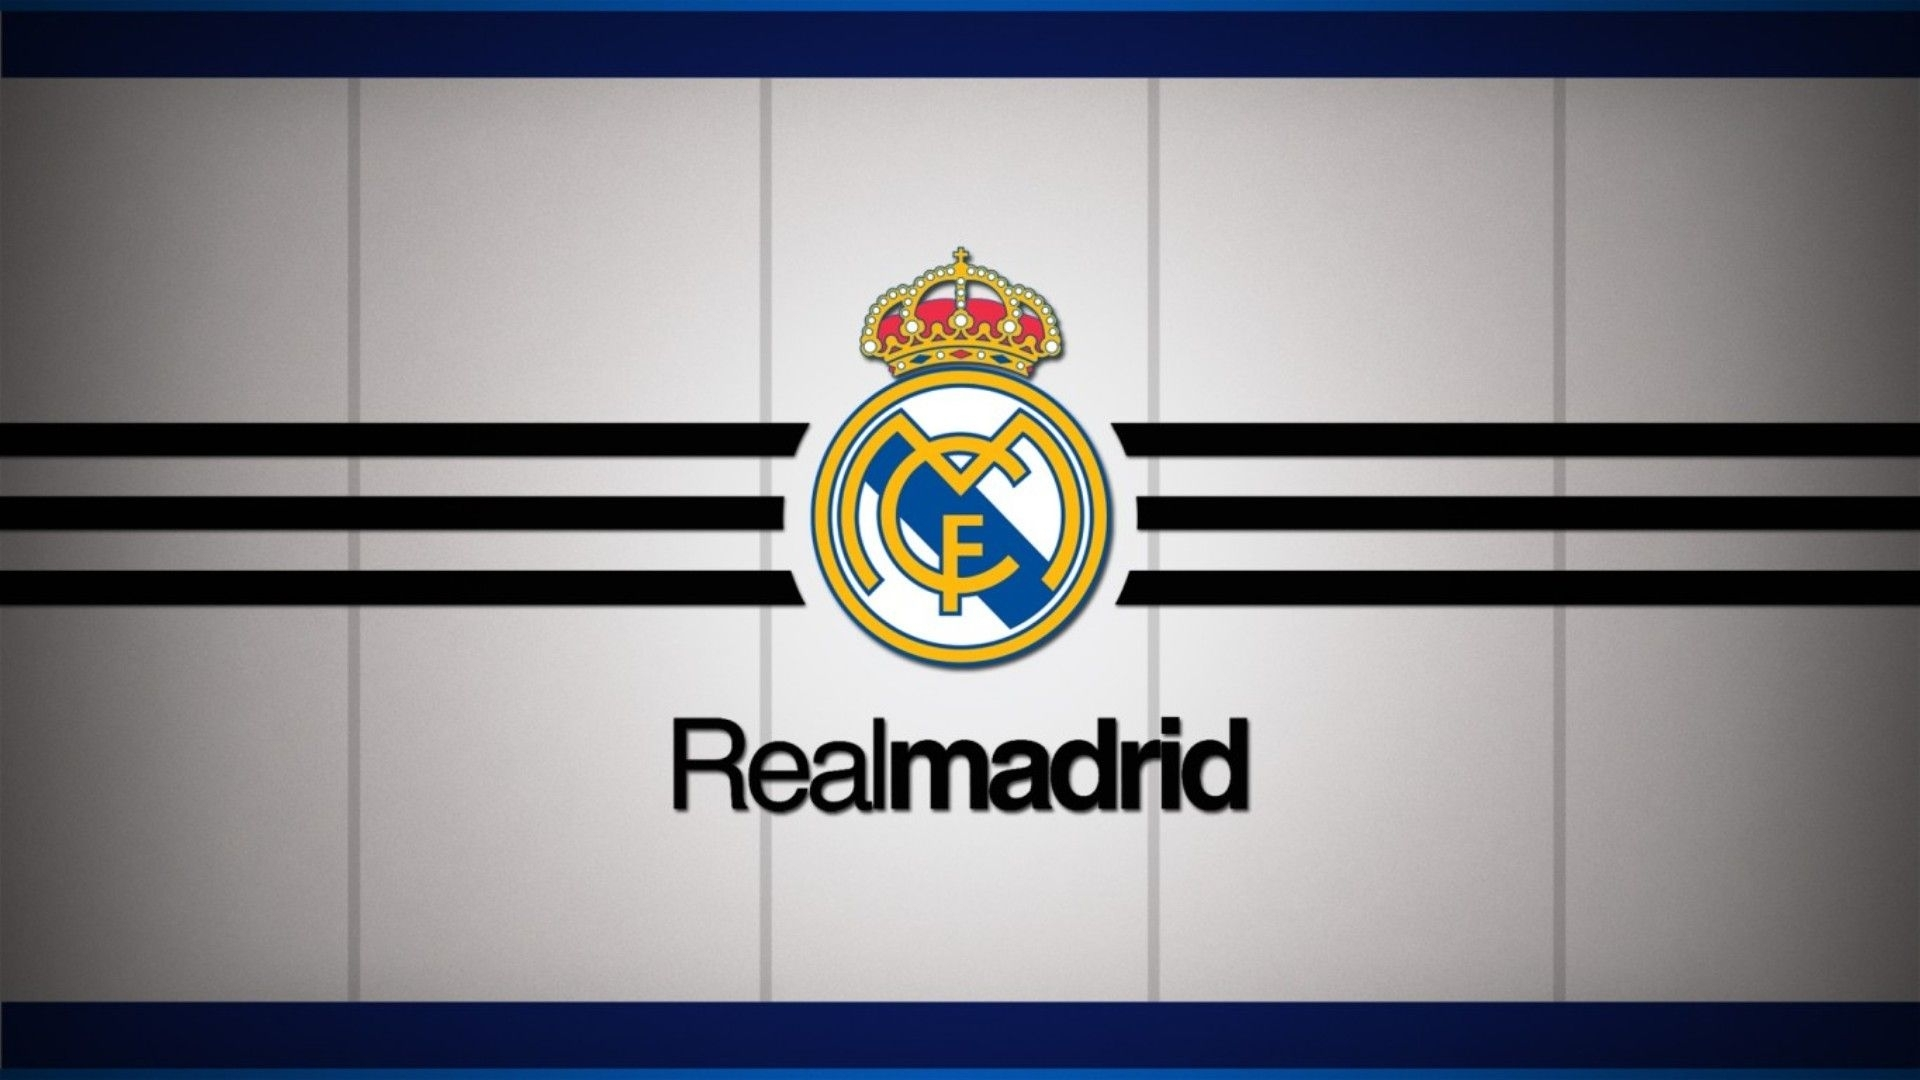 real madrid logo wallpaper 1080p   real madrid   pinterest